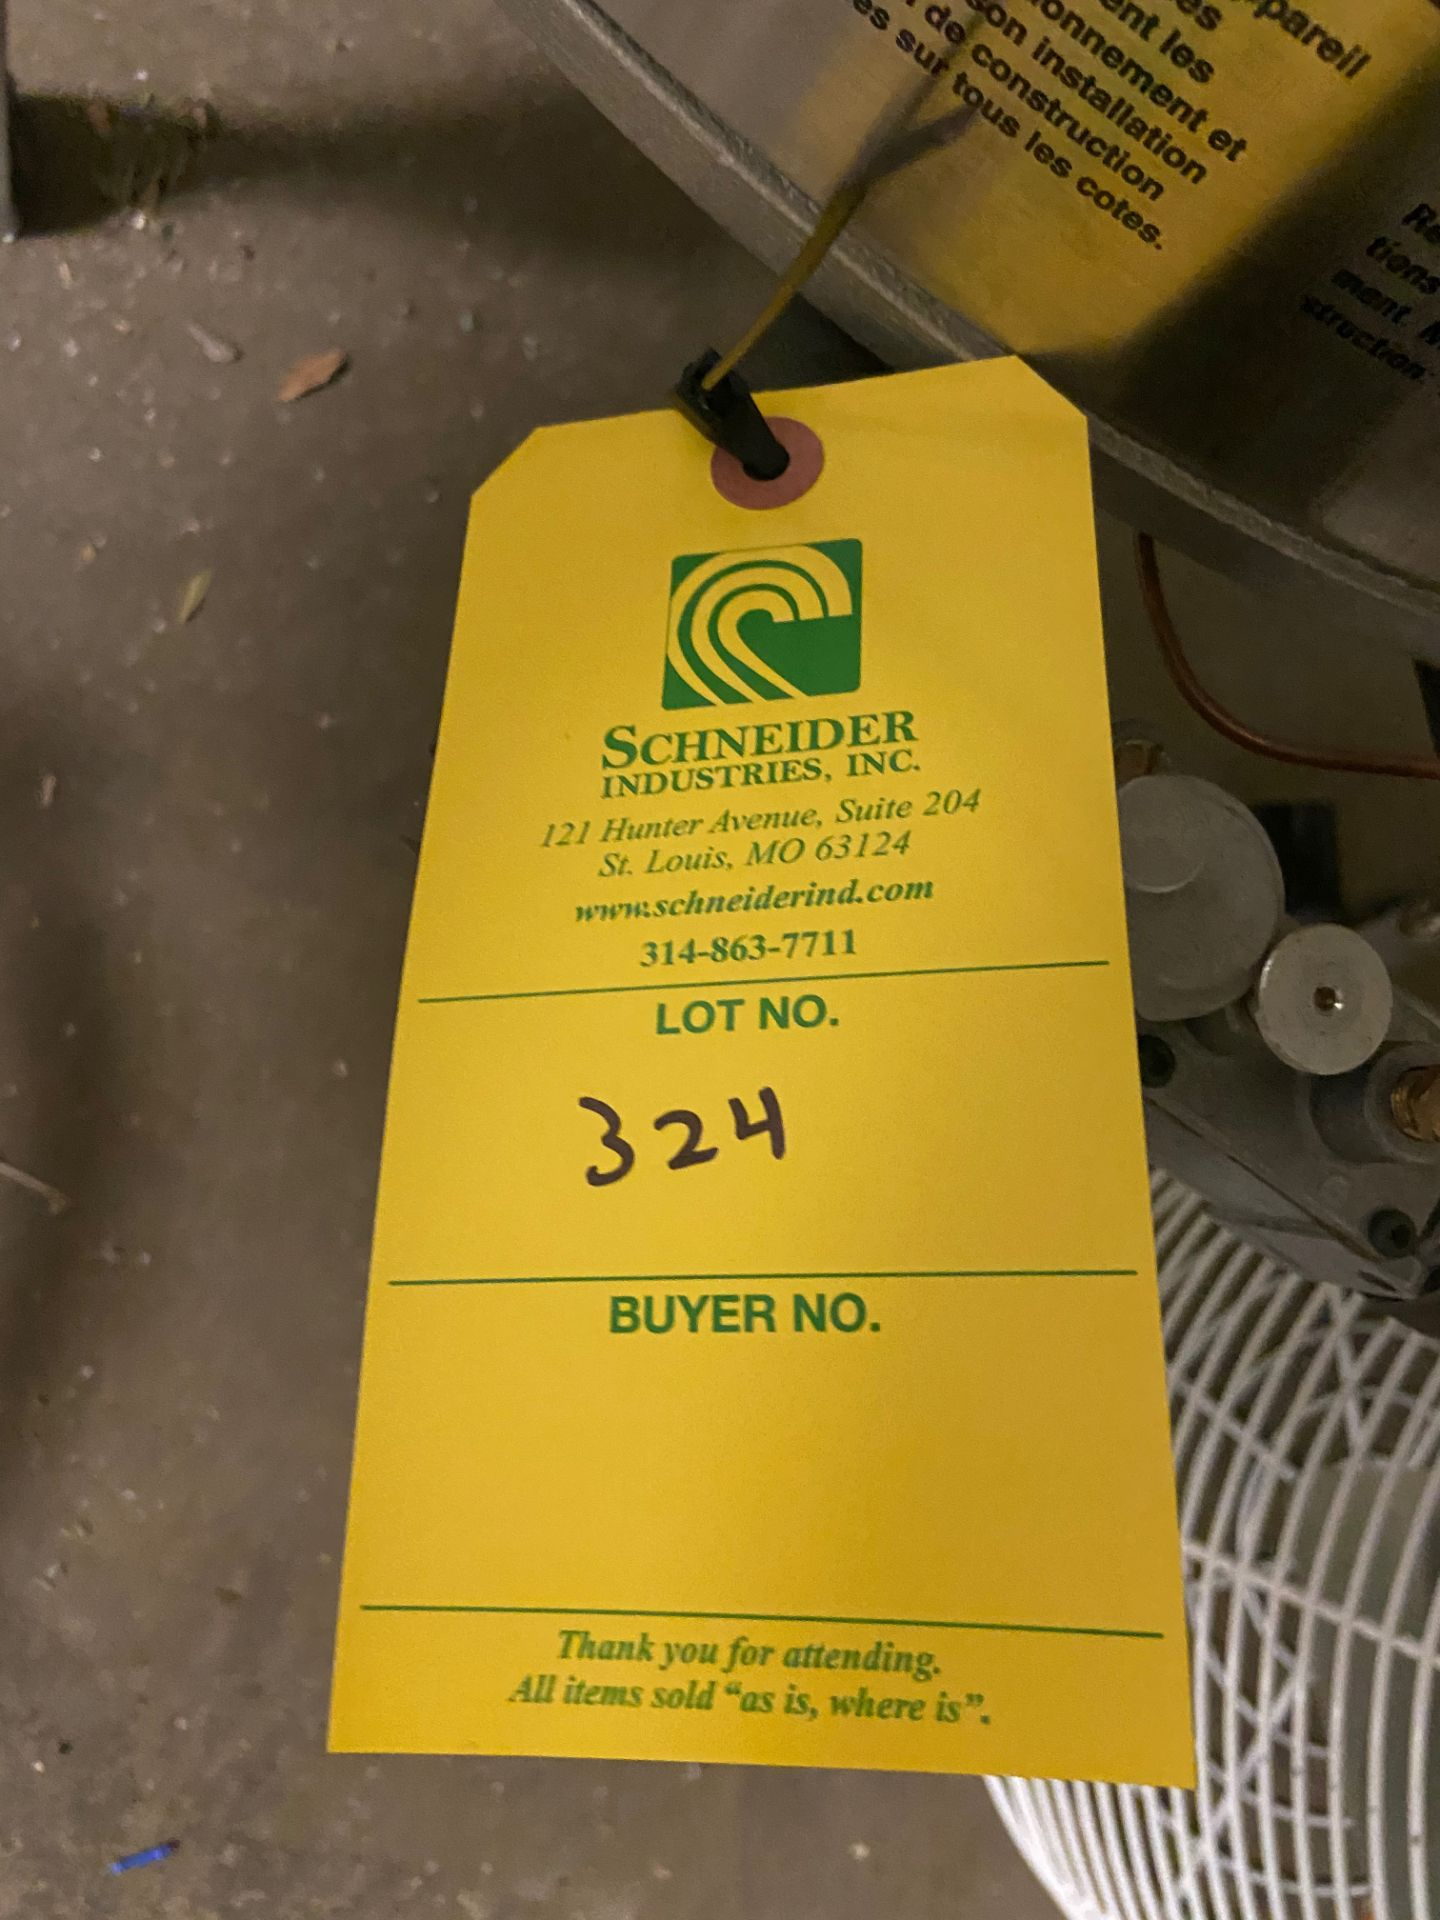 NEW Savage Bros Gas Candy Stove, Model# 20B, Serial# 024376, 80,000 BTU/HR - Image 6 of 6